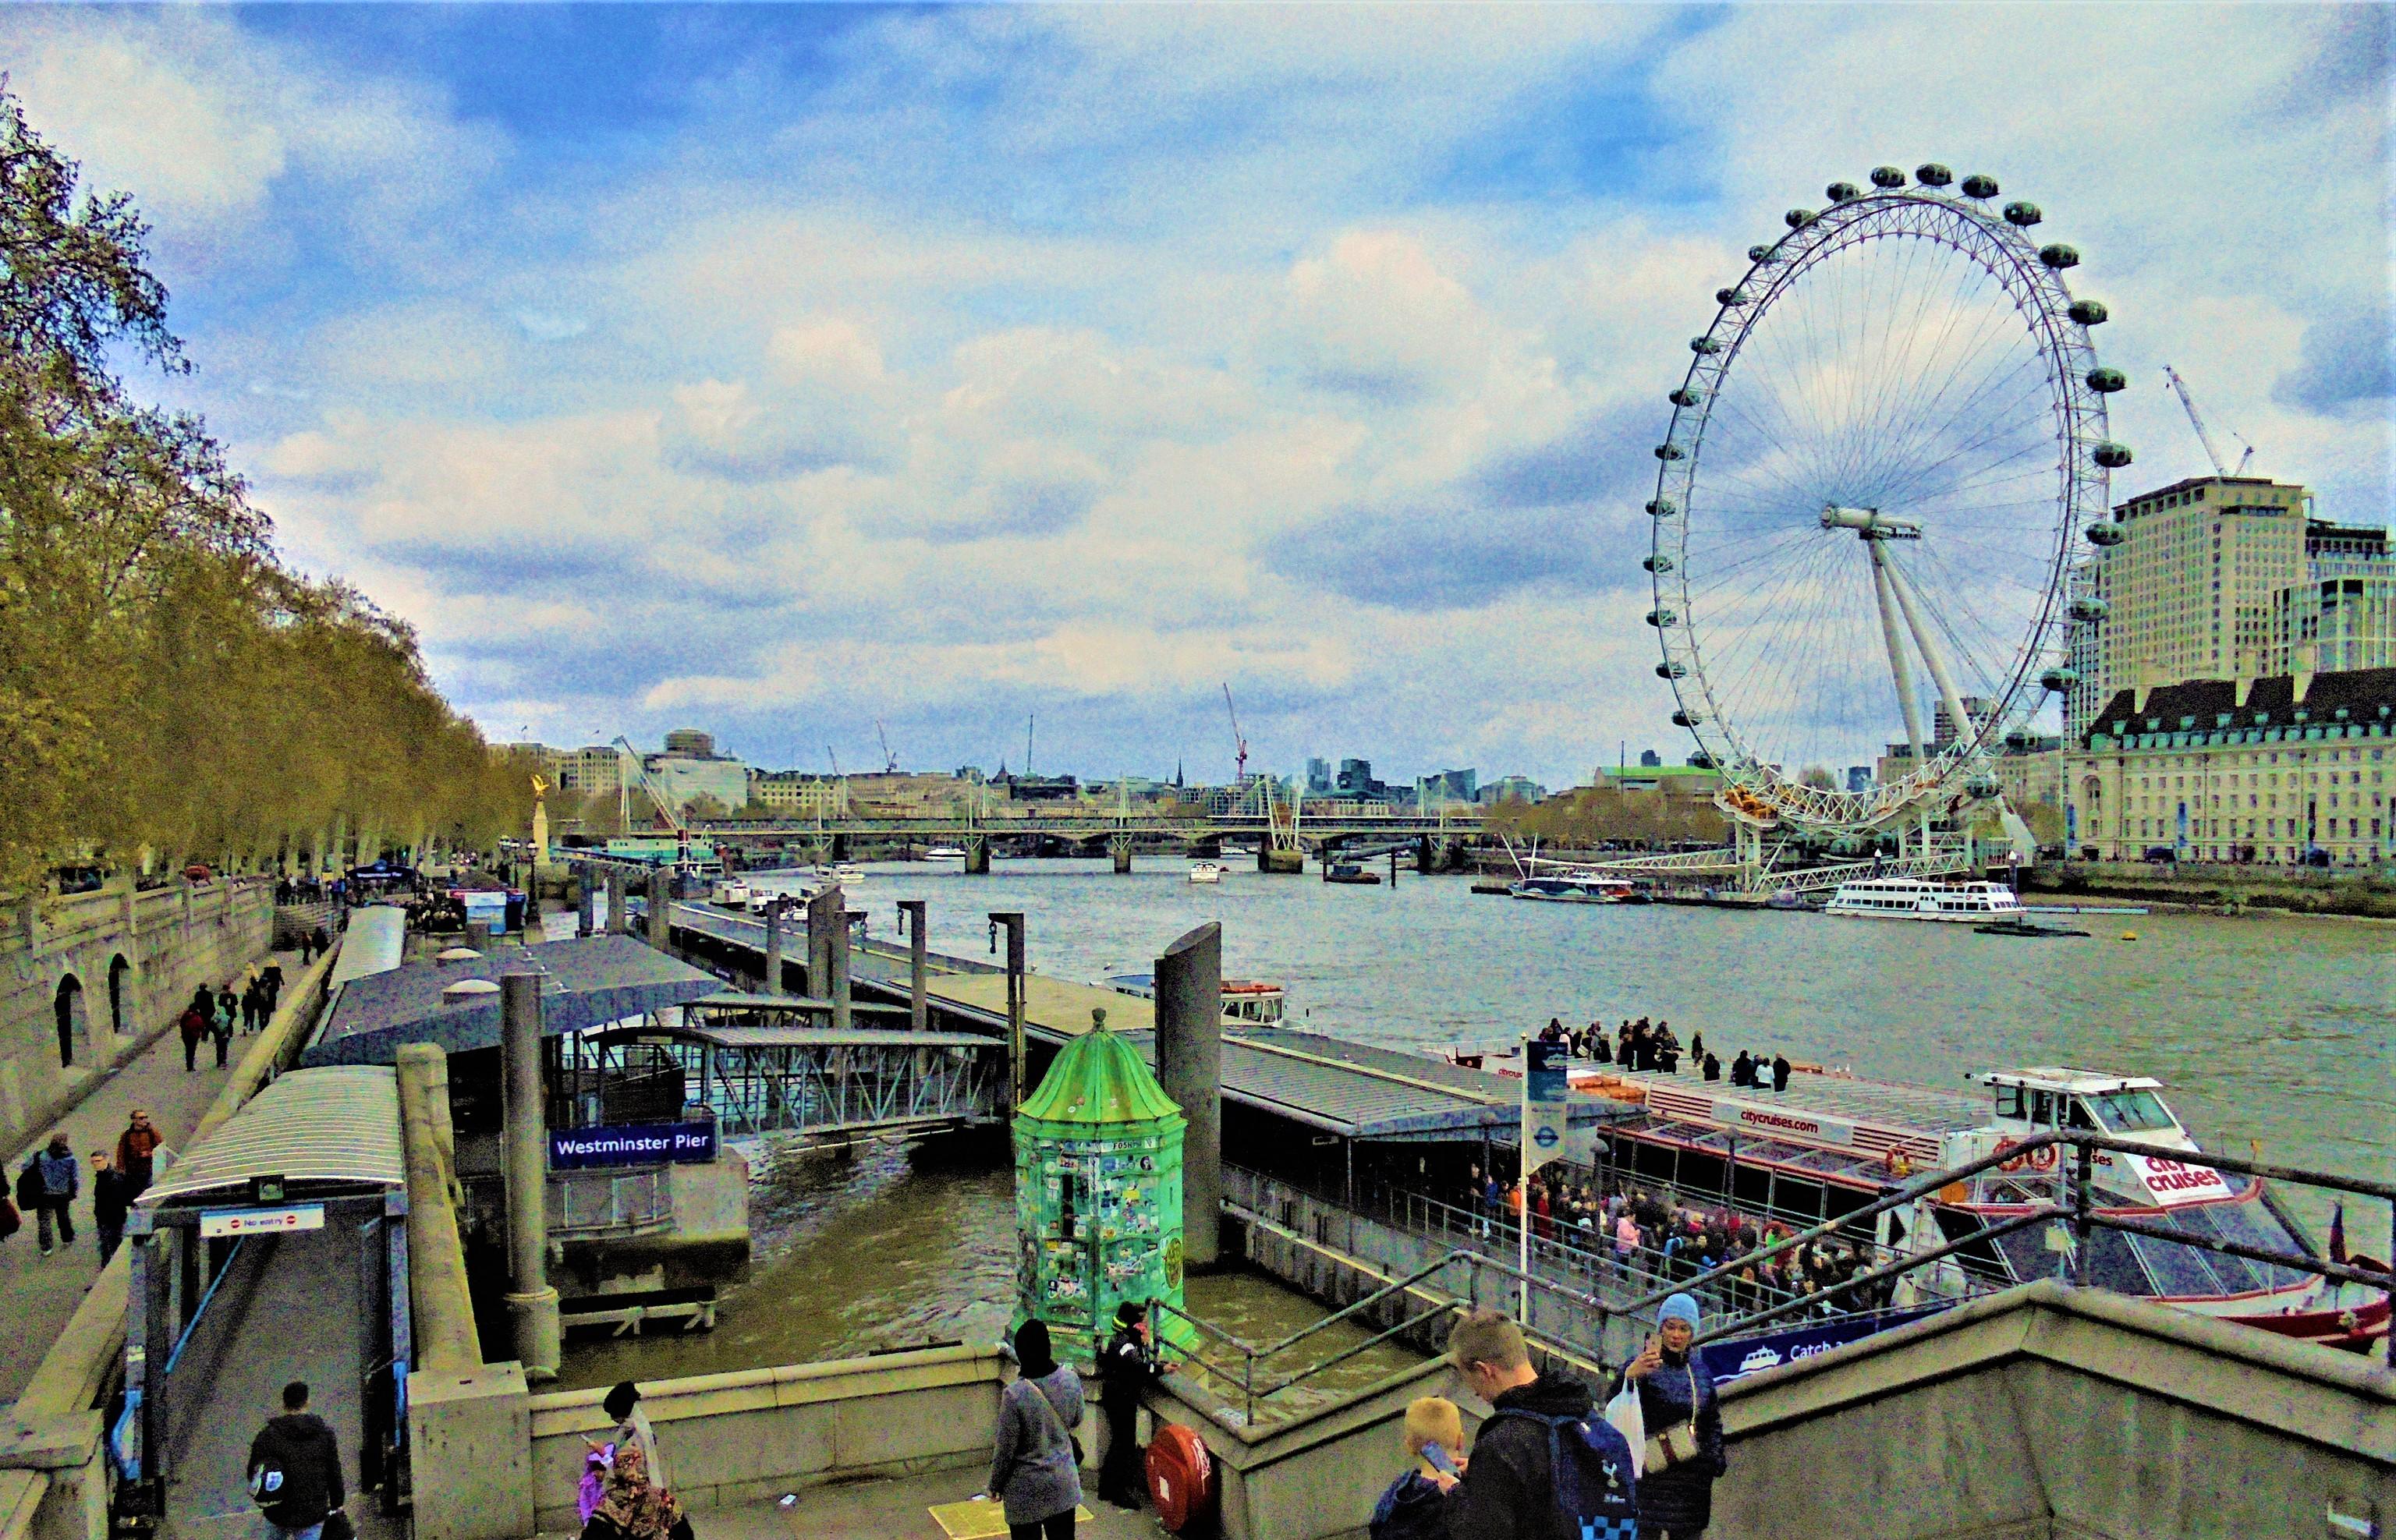 Westminster Pier, Westminster, London